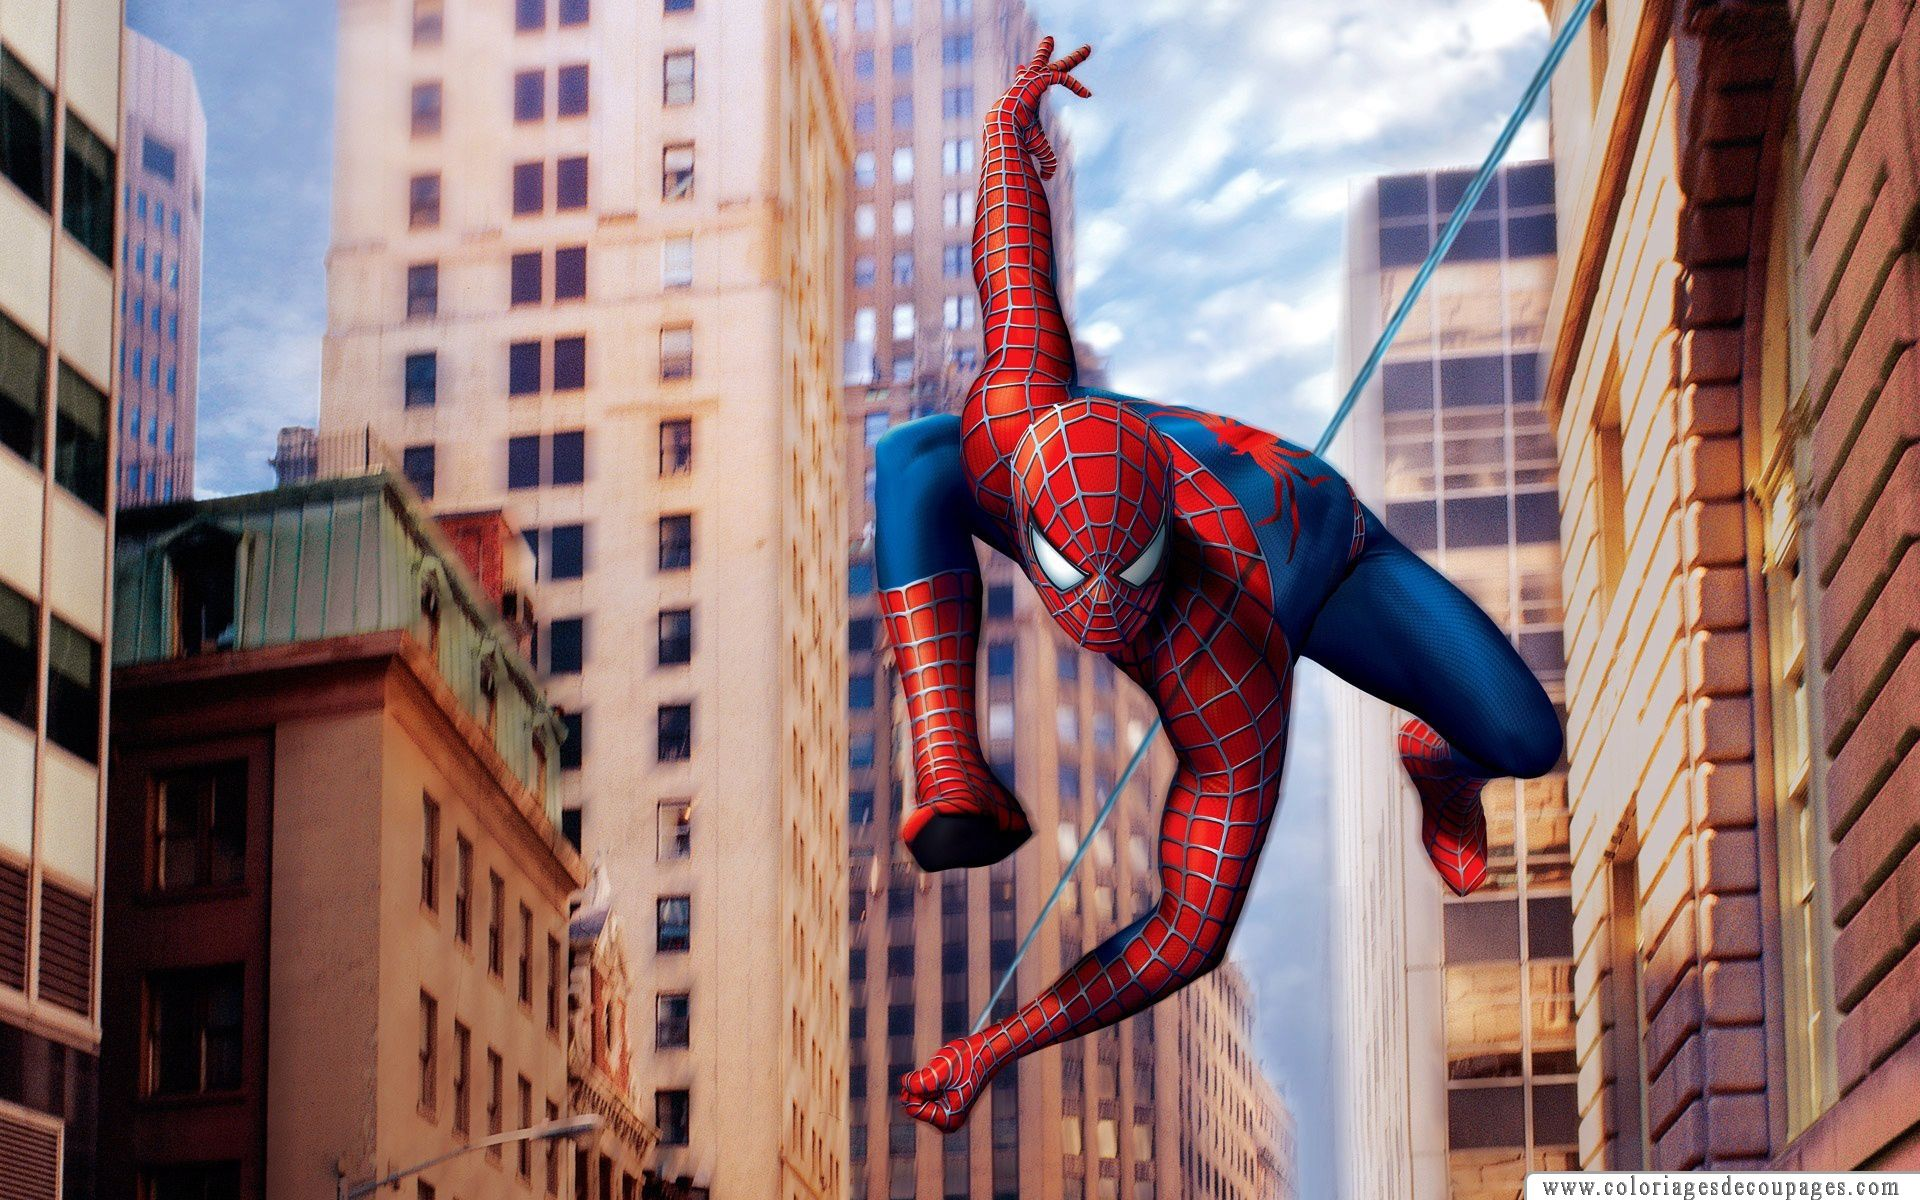 fond d'écran marvel Spiderman Marvel Fond Ecran, Fonds d